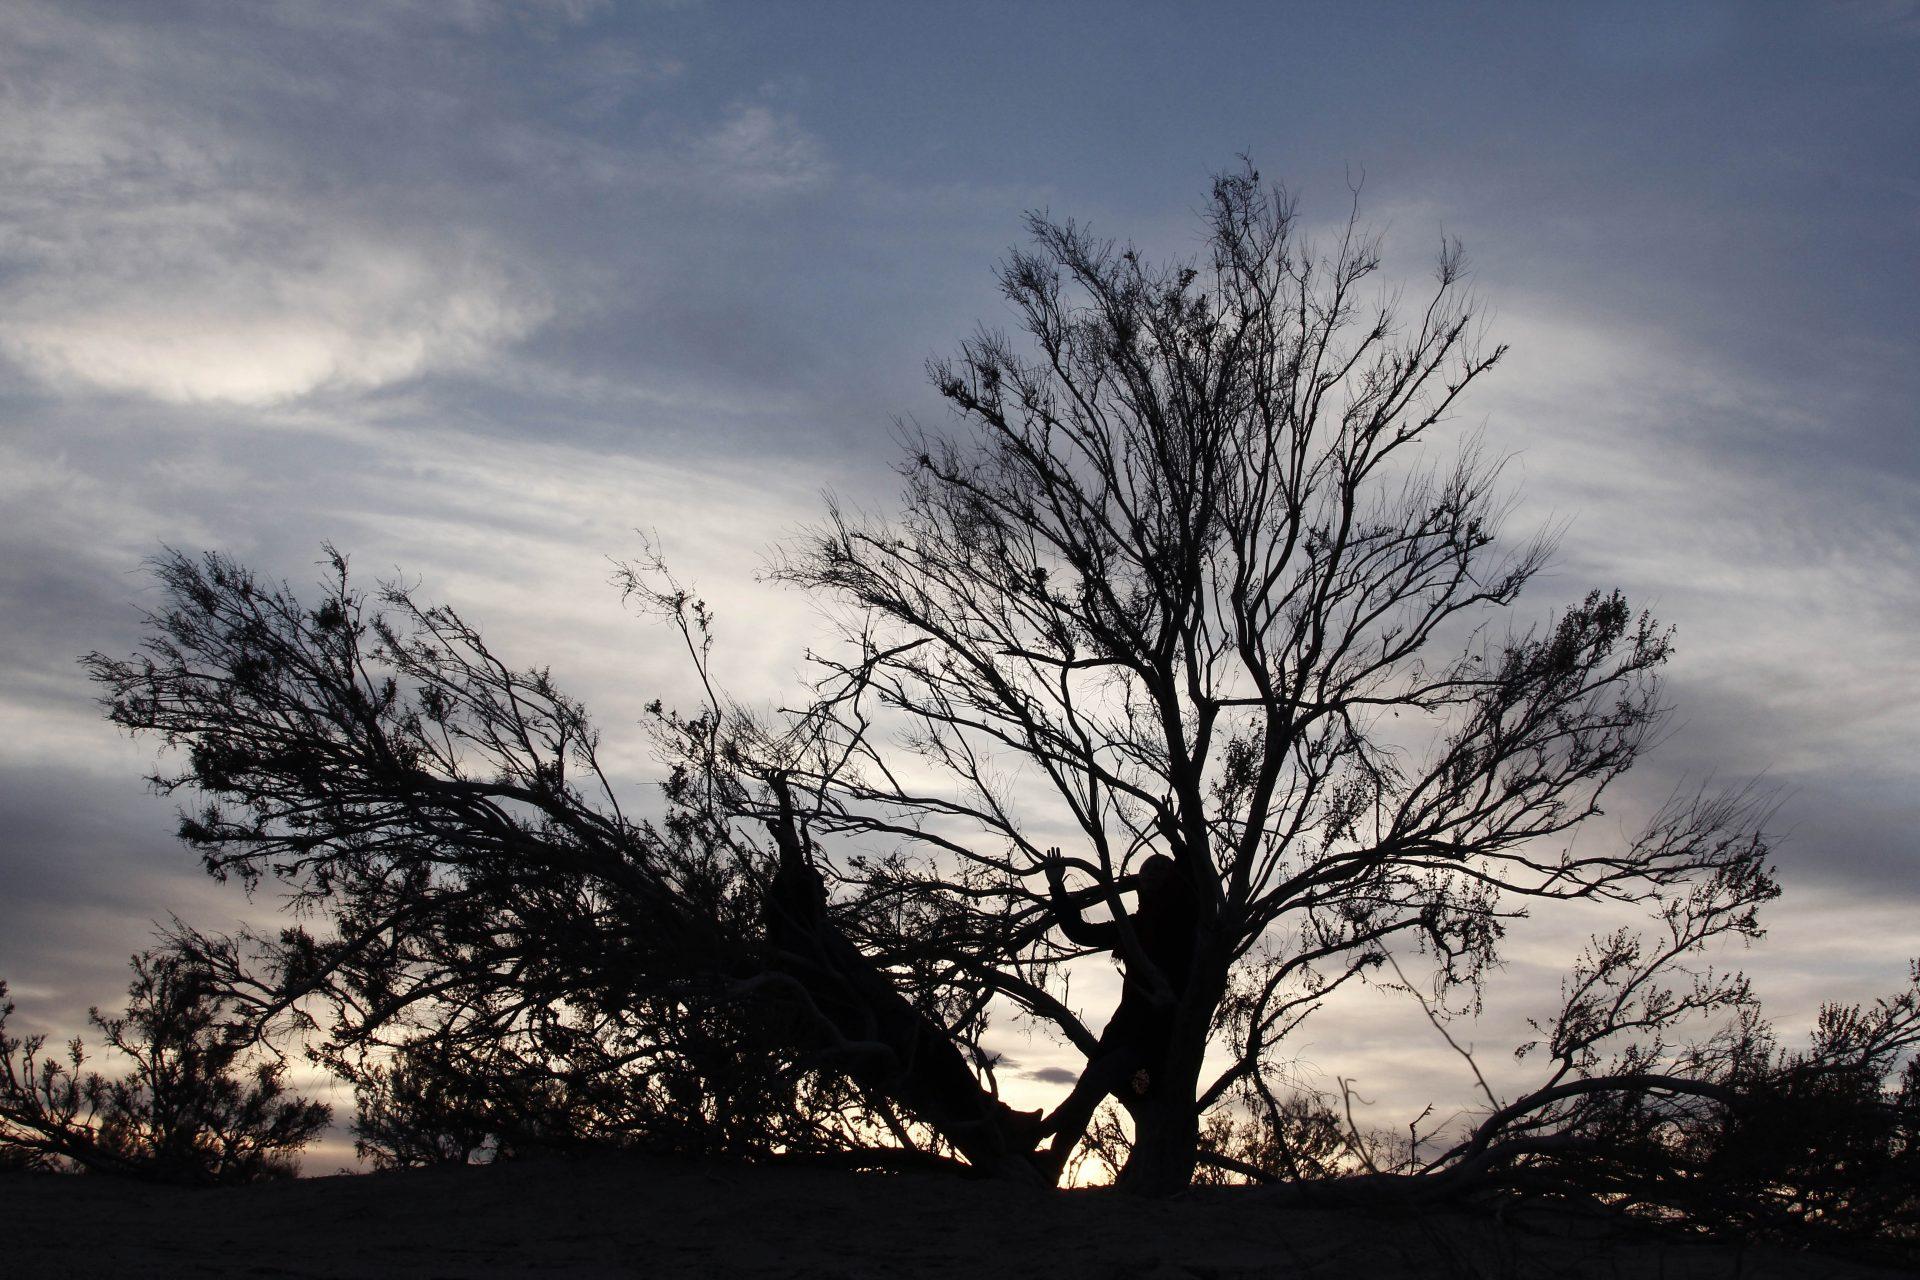 Leaning in tree-TaraGoudarzi-KarinvanderMolen-collaboration-Reyhaneh zanganeh -Khara-desert-2016 _1